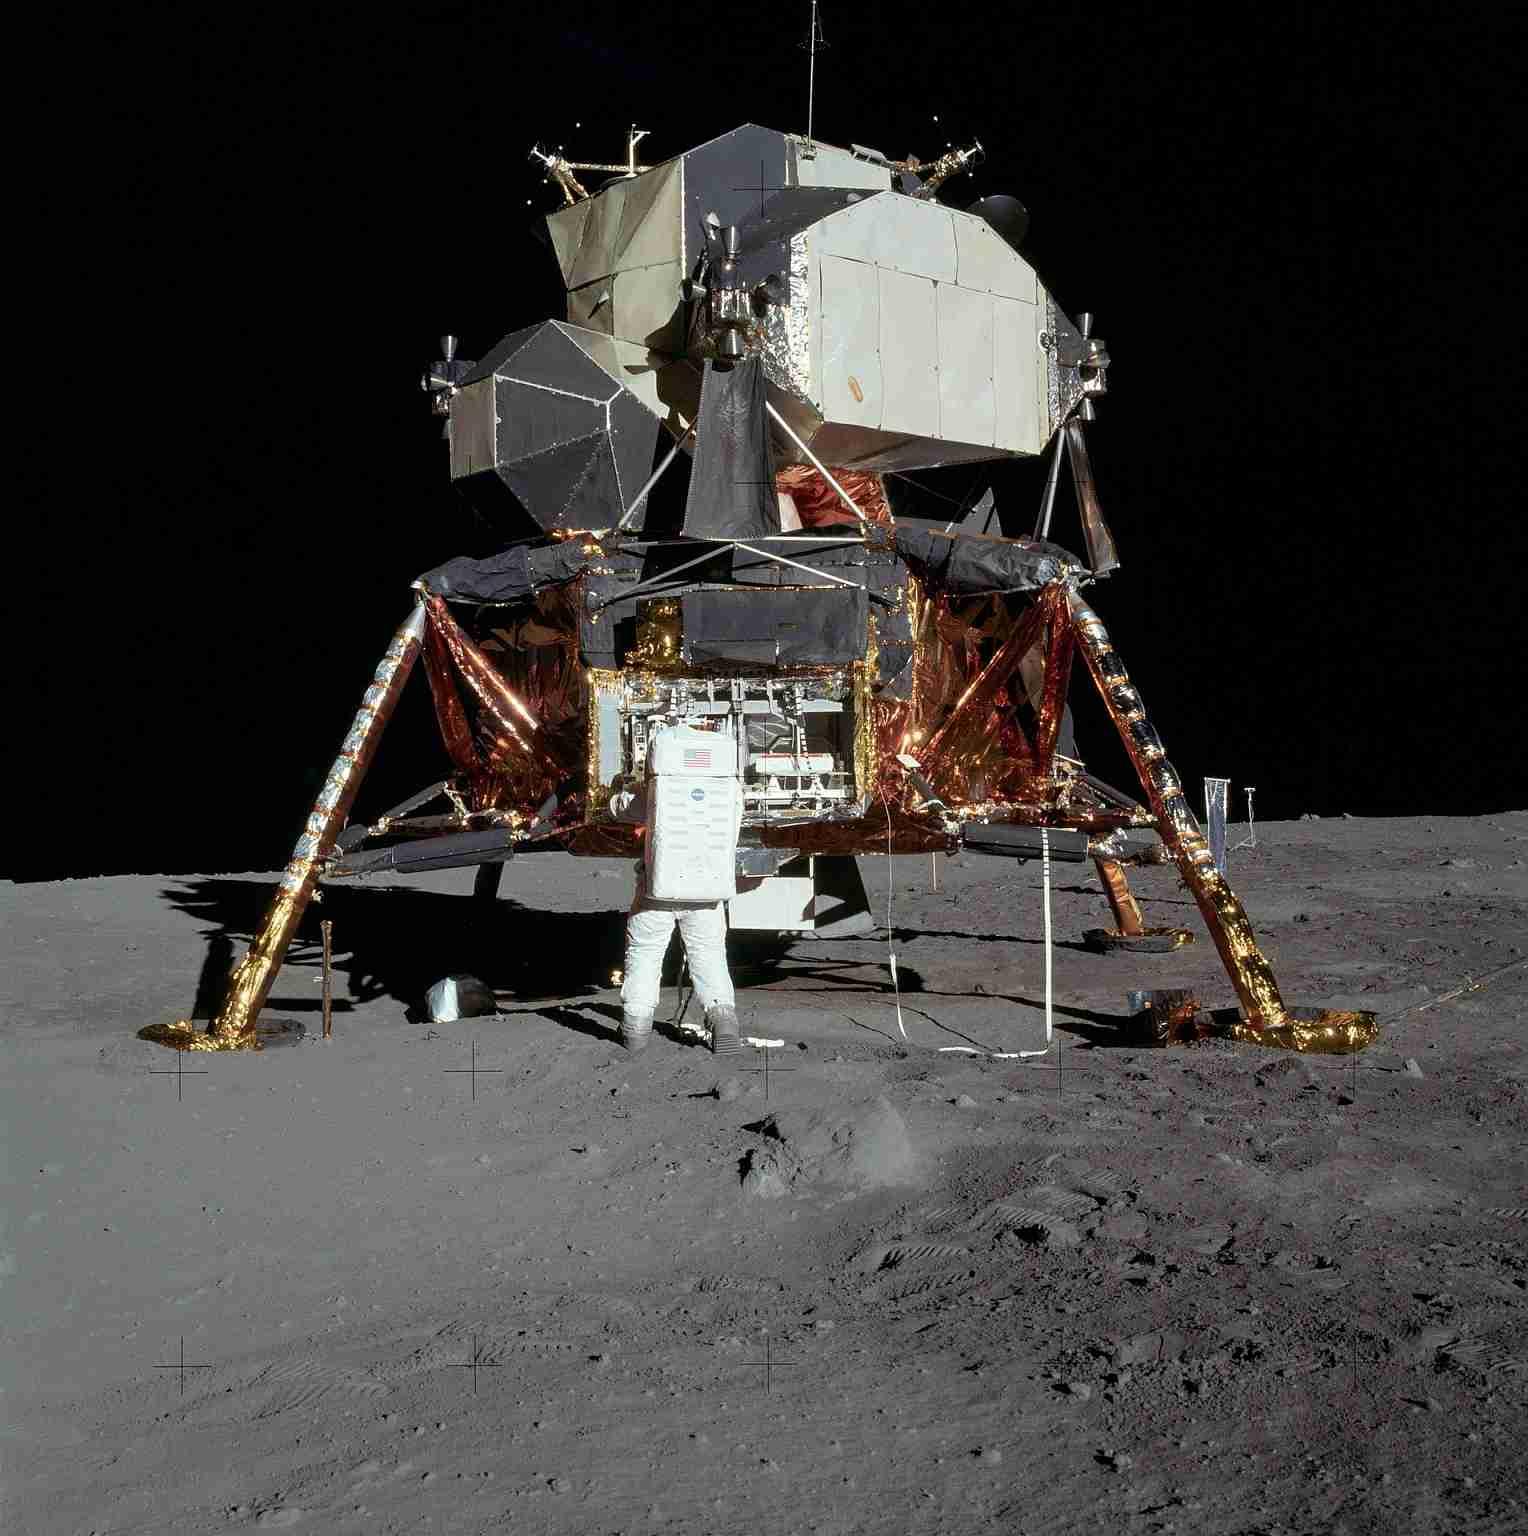 luna mision espacial apolo